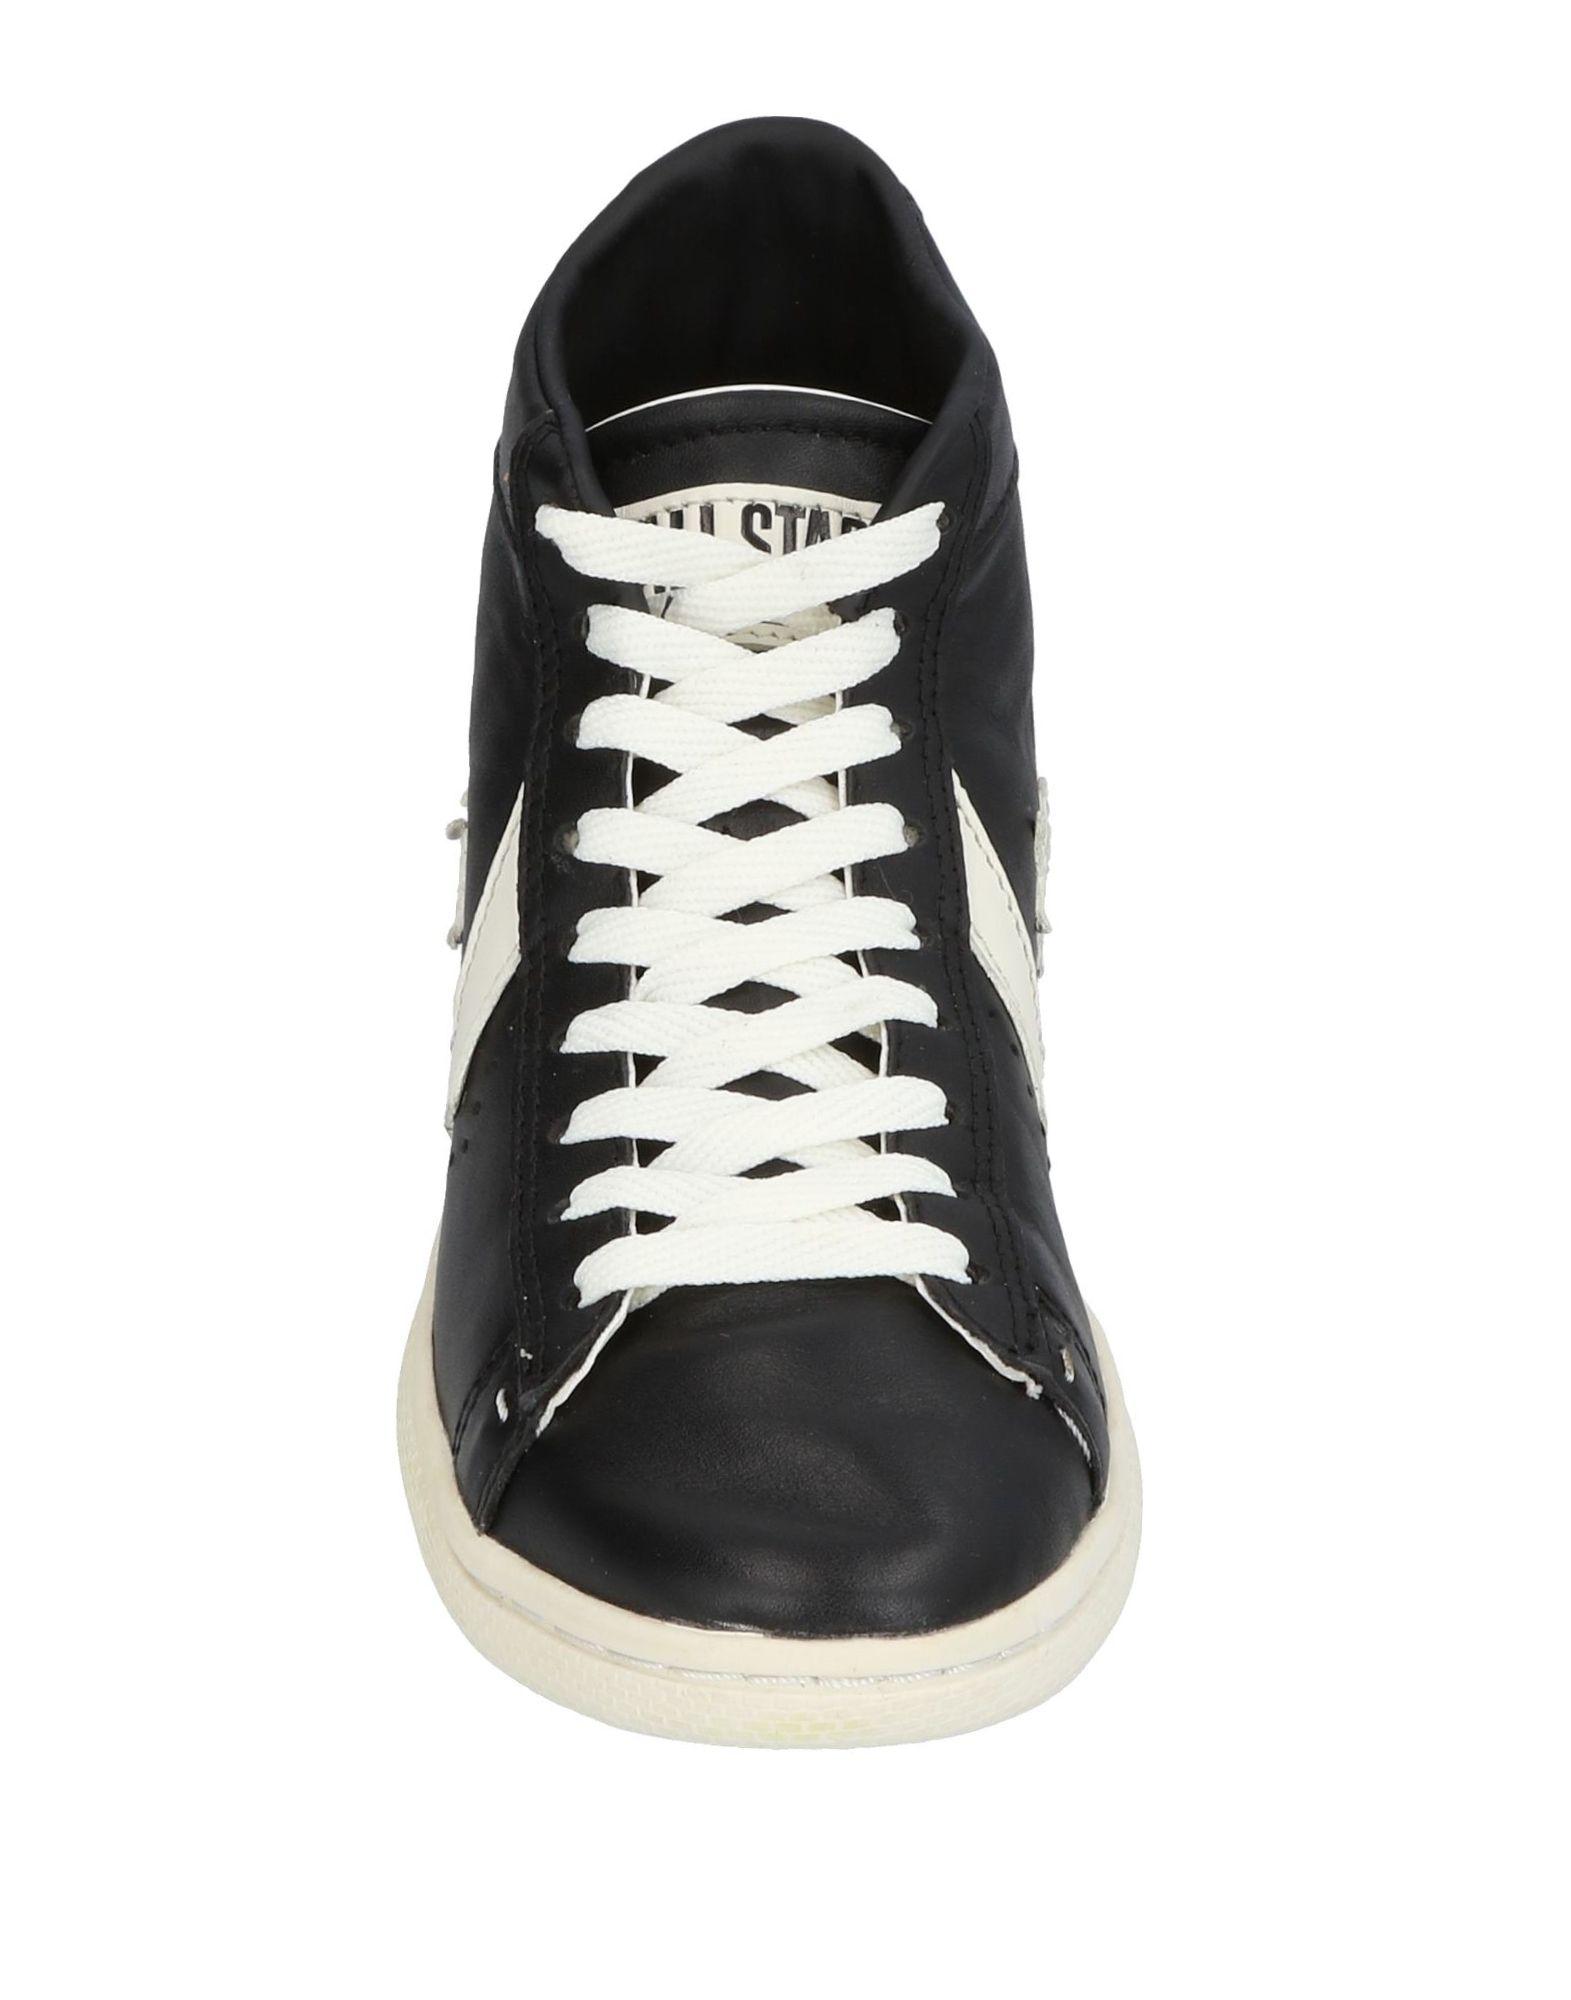 a11e49789b9 CONVERSE ALL STAR ΠΑΠΟΥΤΣΙΑ Χαμηλά sneakers, Γυναικεία sneakers, ΓΥΝΑΙΚΑ    ΠΑΠΟΥΤΣΙΑ   SNEAKERS